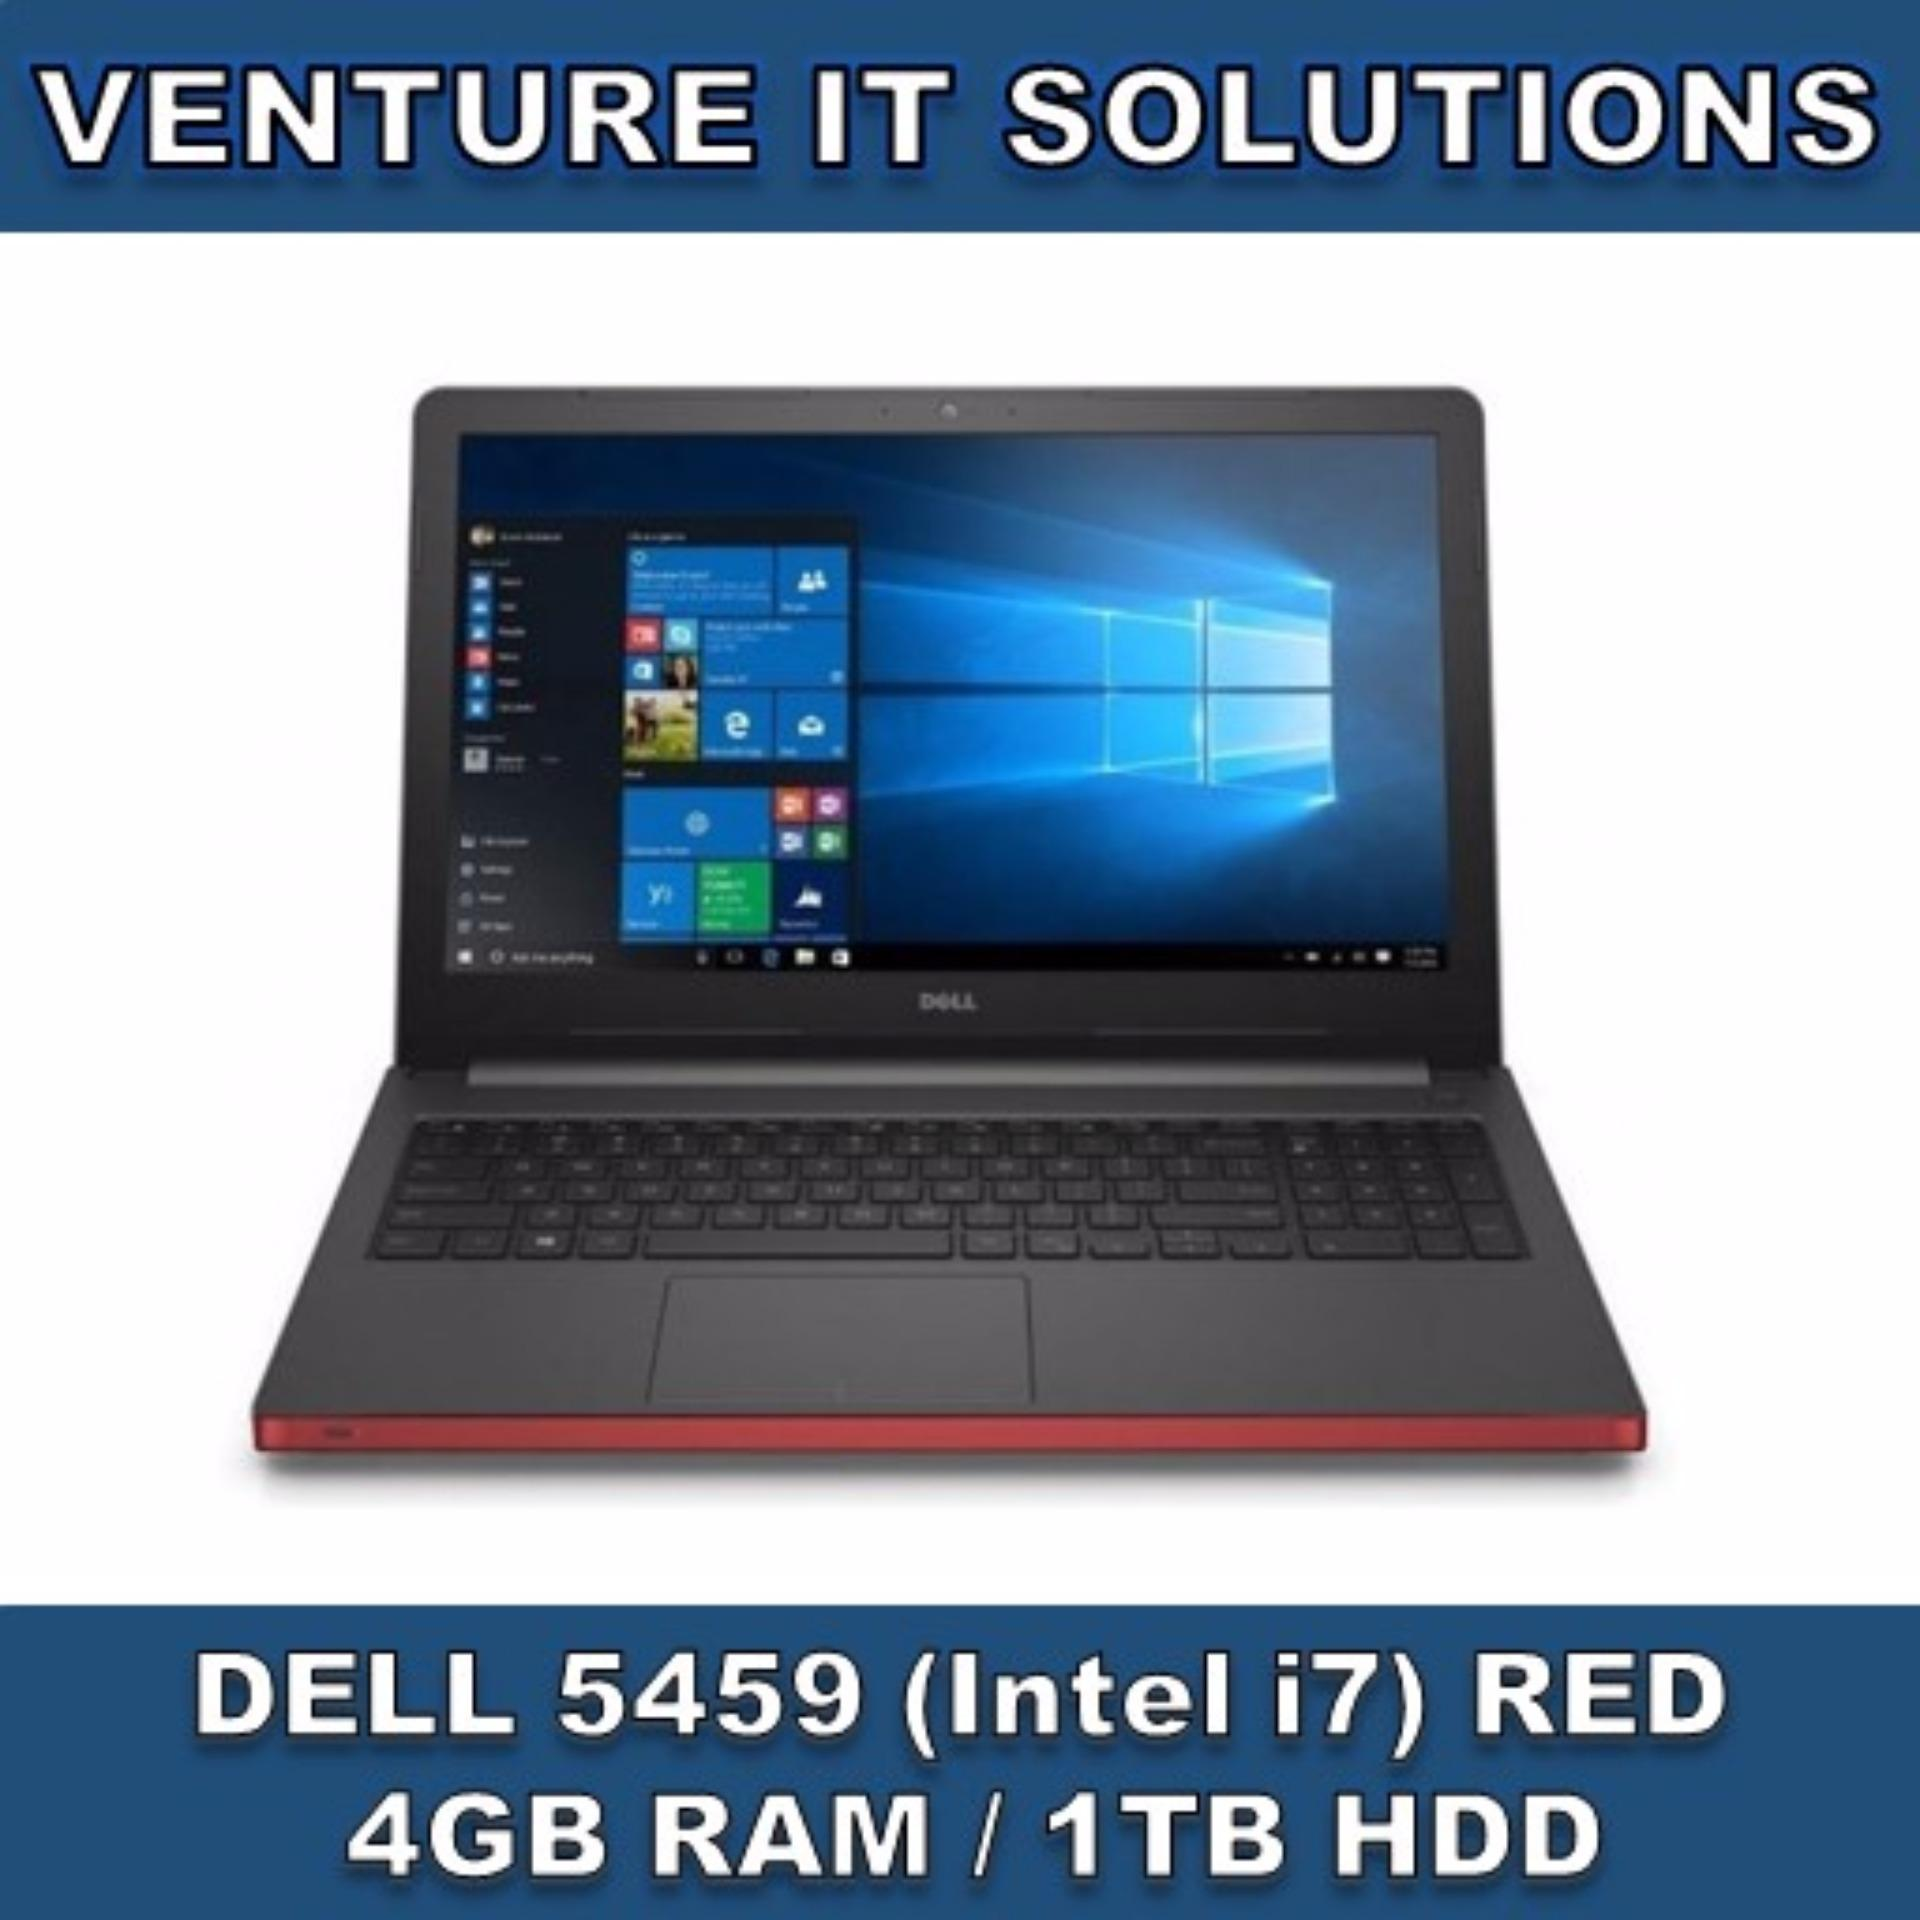 DELL 5459/ INTEL CORE I7-65002.5GHZ MAX 3.1 GHZ / 4GB RAM / 1TBHDD / 4GB RADEON GRAPHICS/ 14″HD LED DISPLAY/ WINDOWS 10